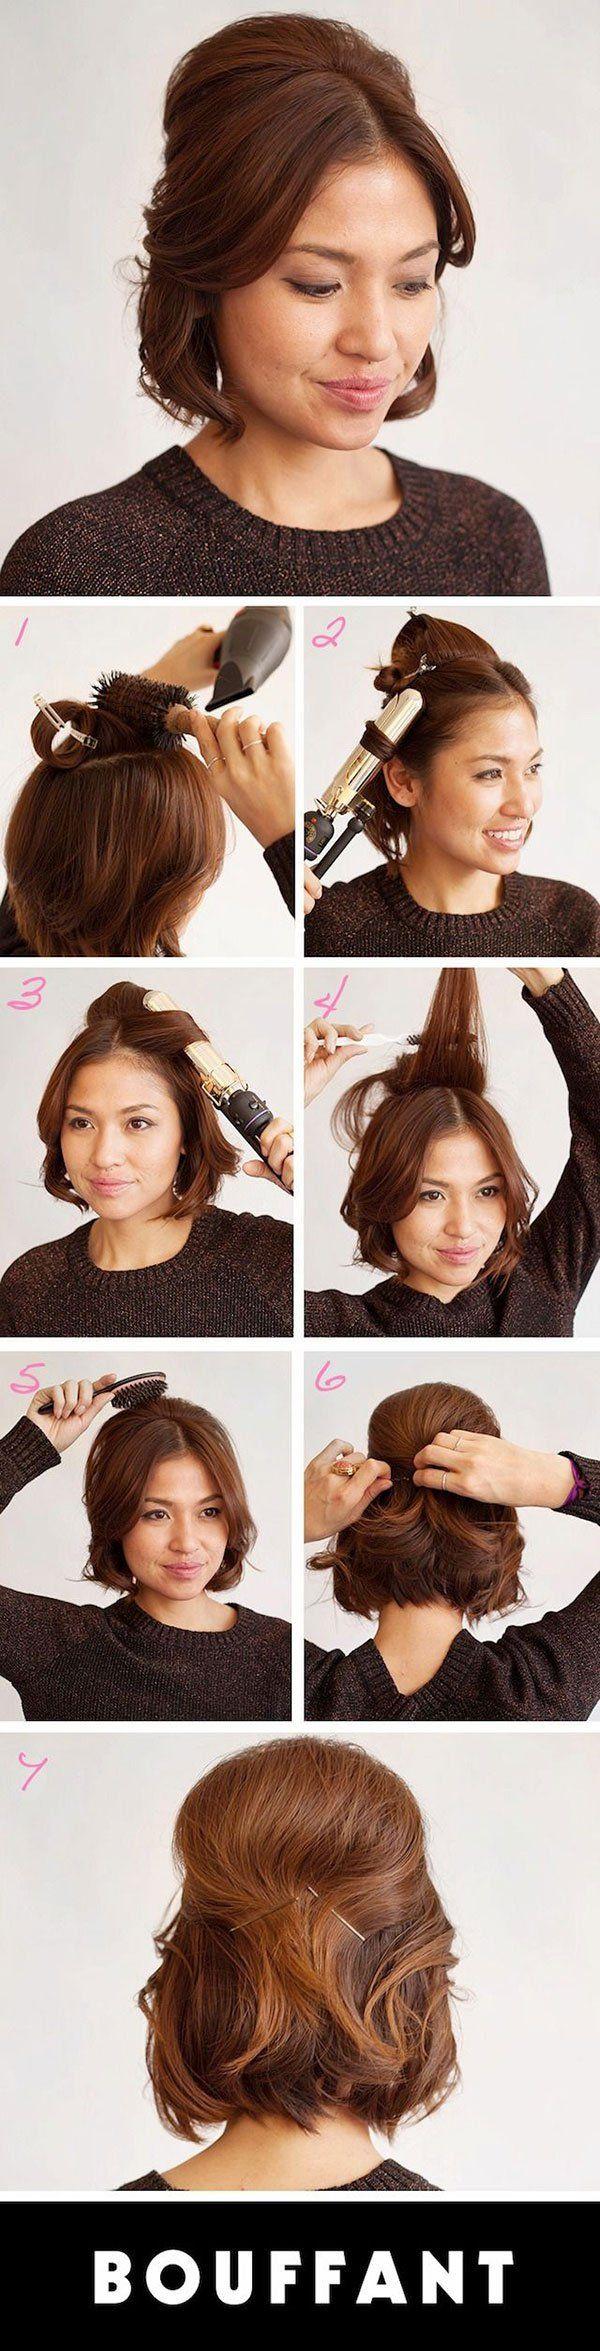 Easy formal hairstyles for short hair bouffant hair updo